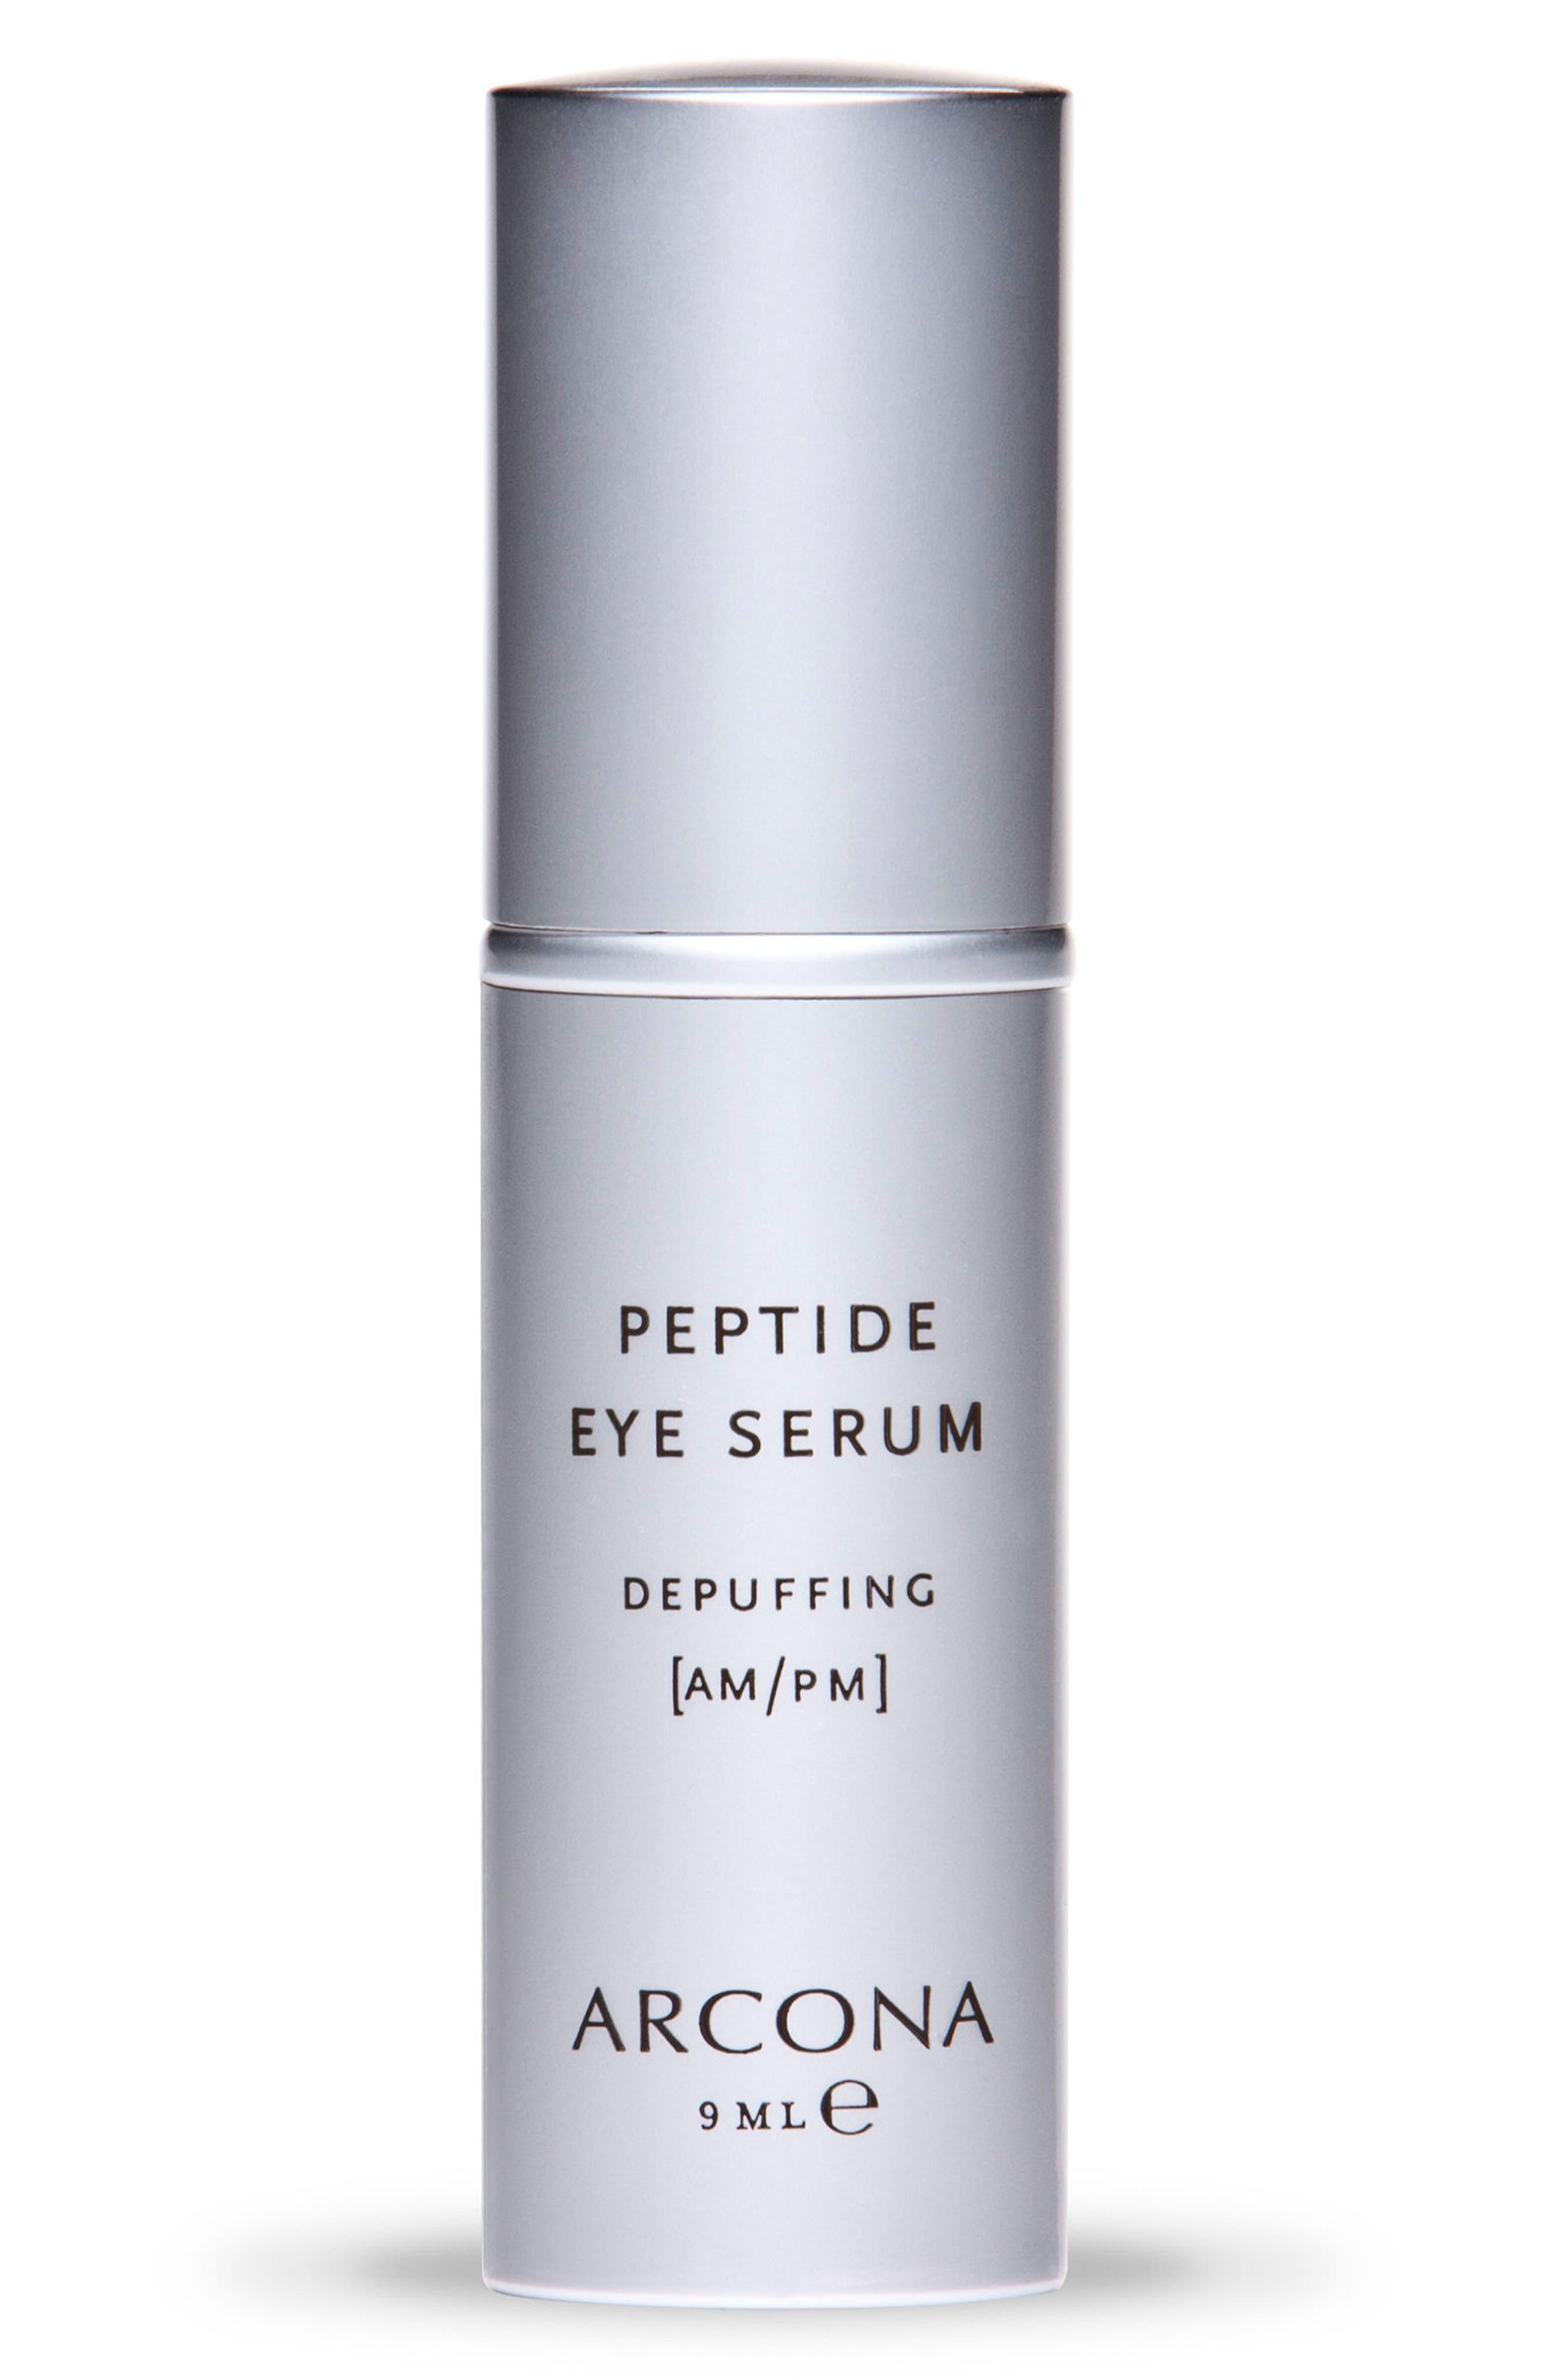 ARCONA Peptide Eye Serum